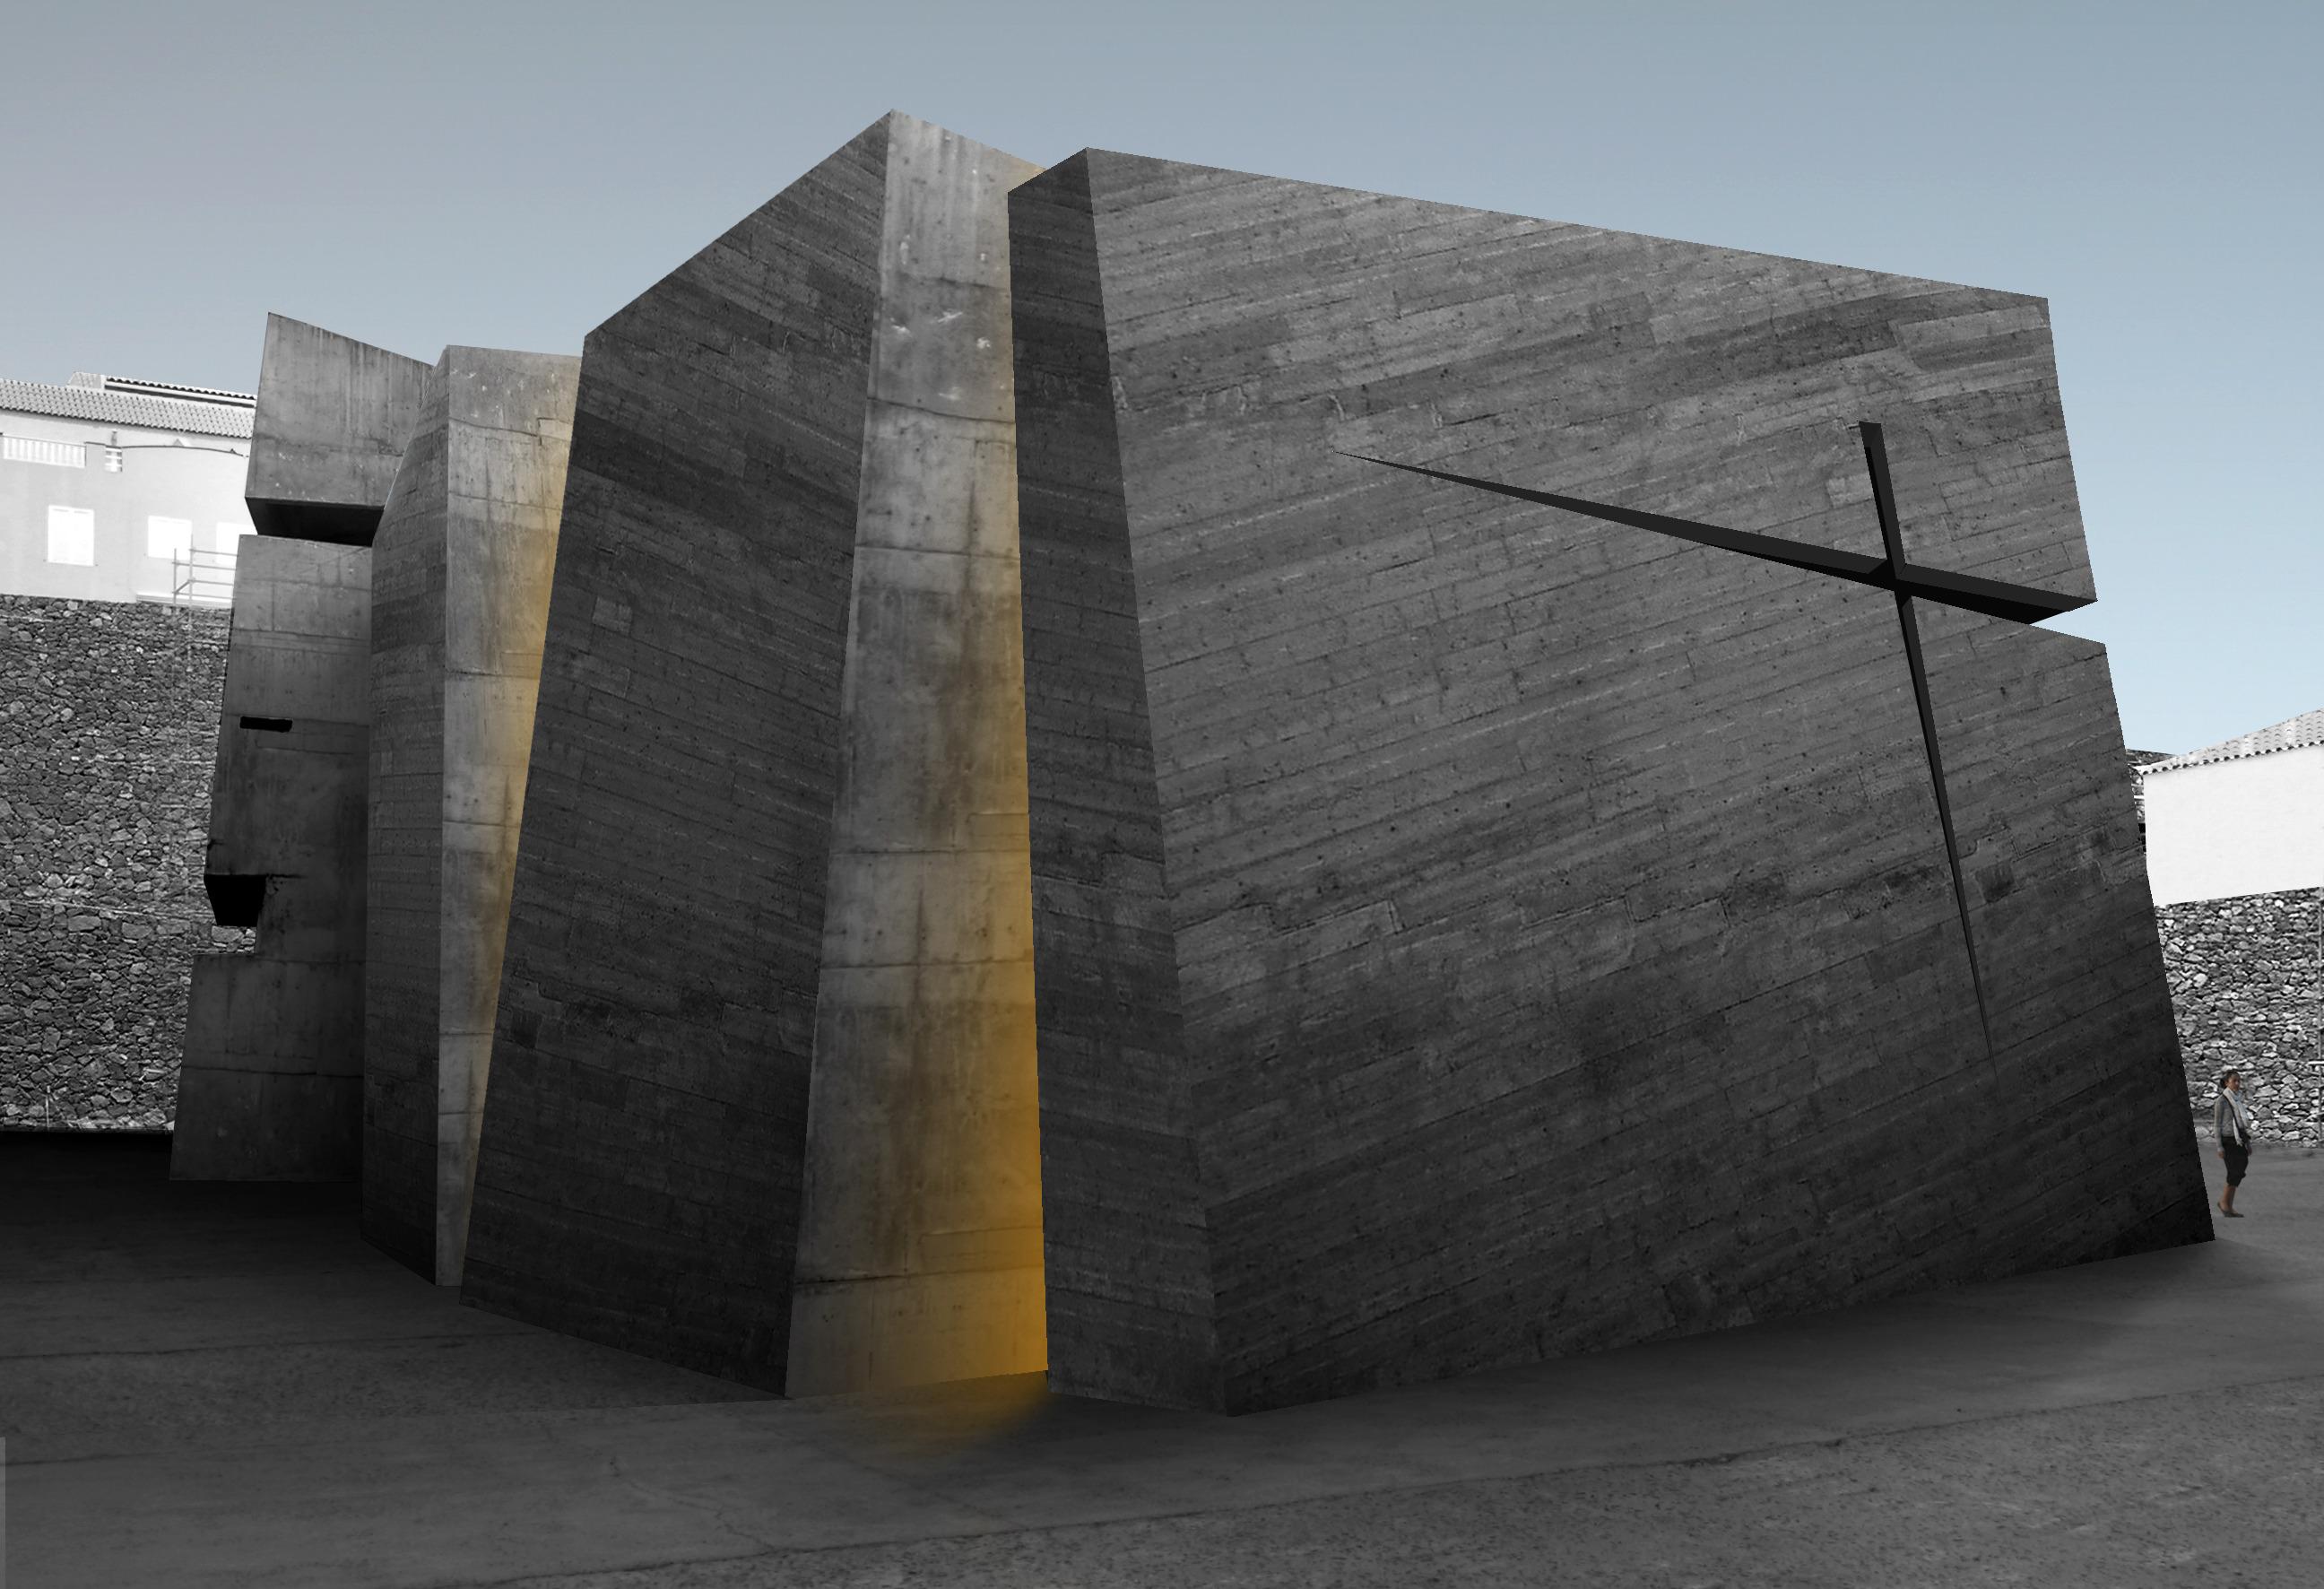 Holy Redeemer Church (Tenerife)